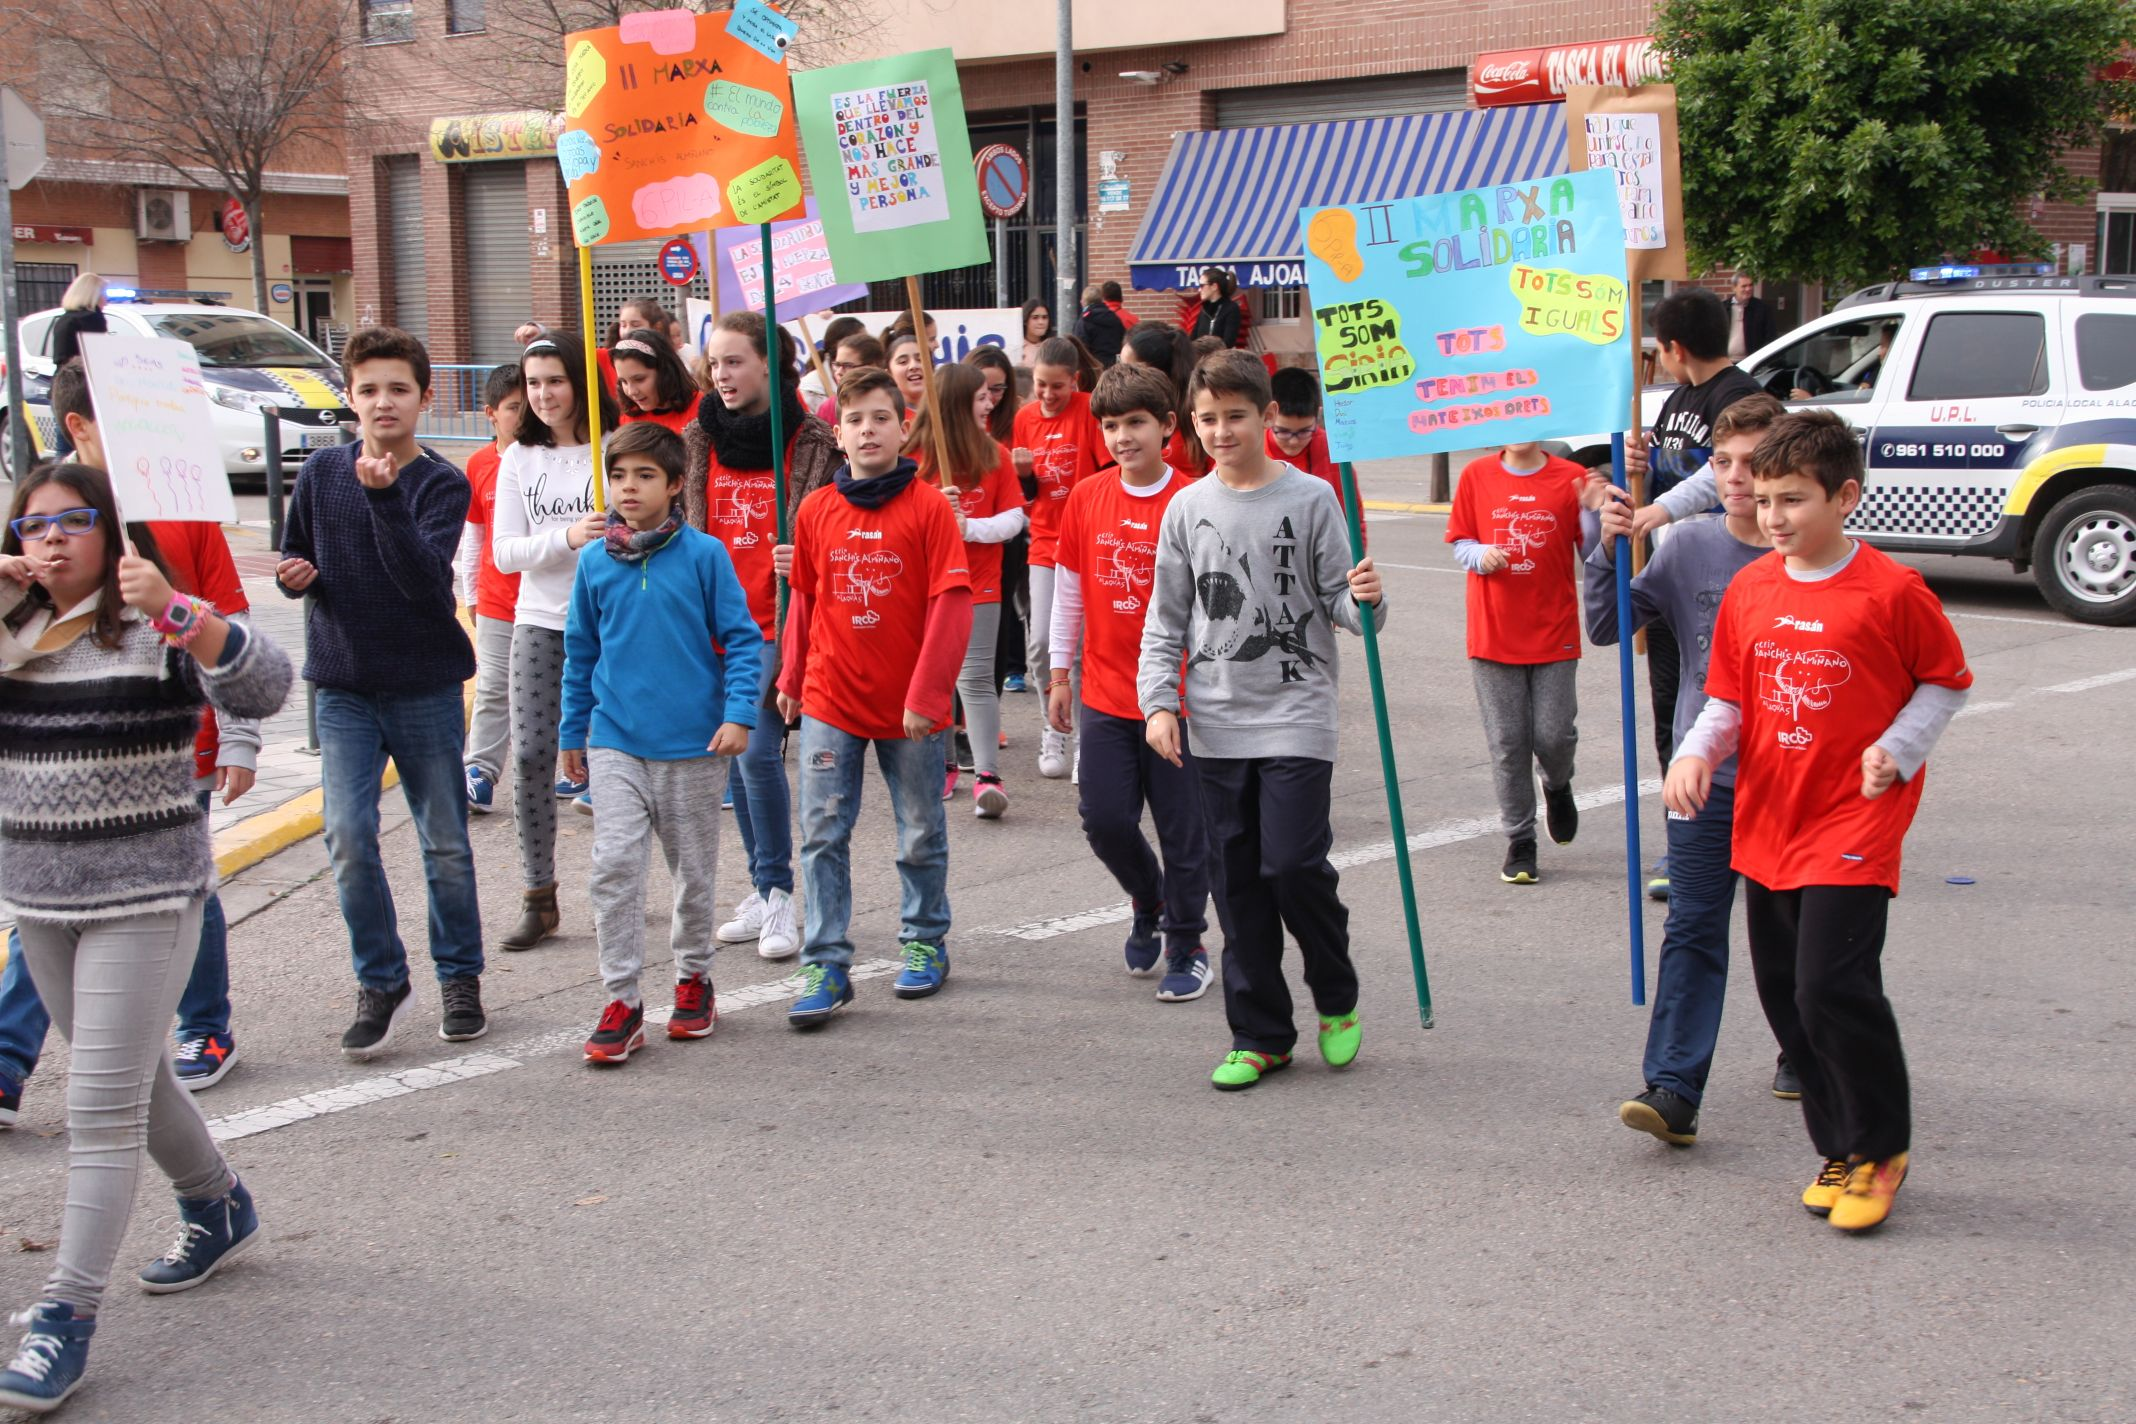 II Marxa Solidaria 2016 (18)